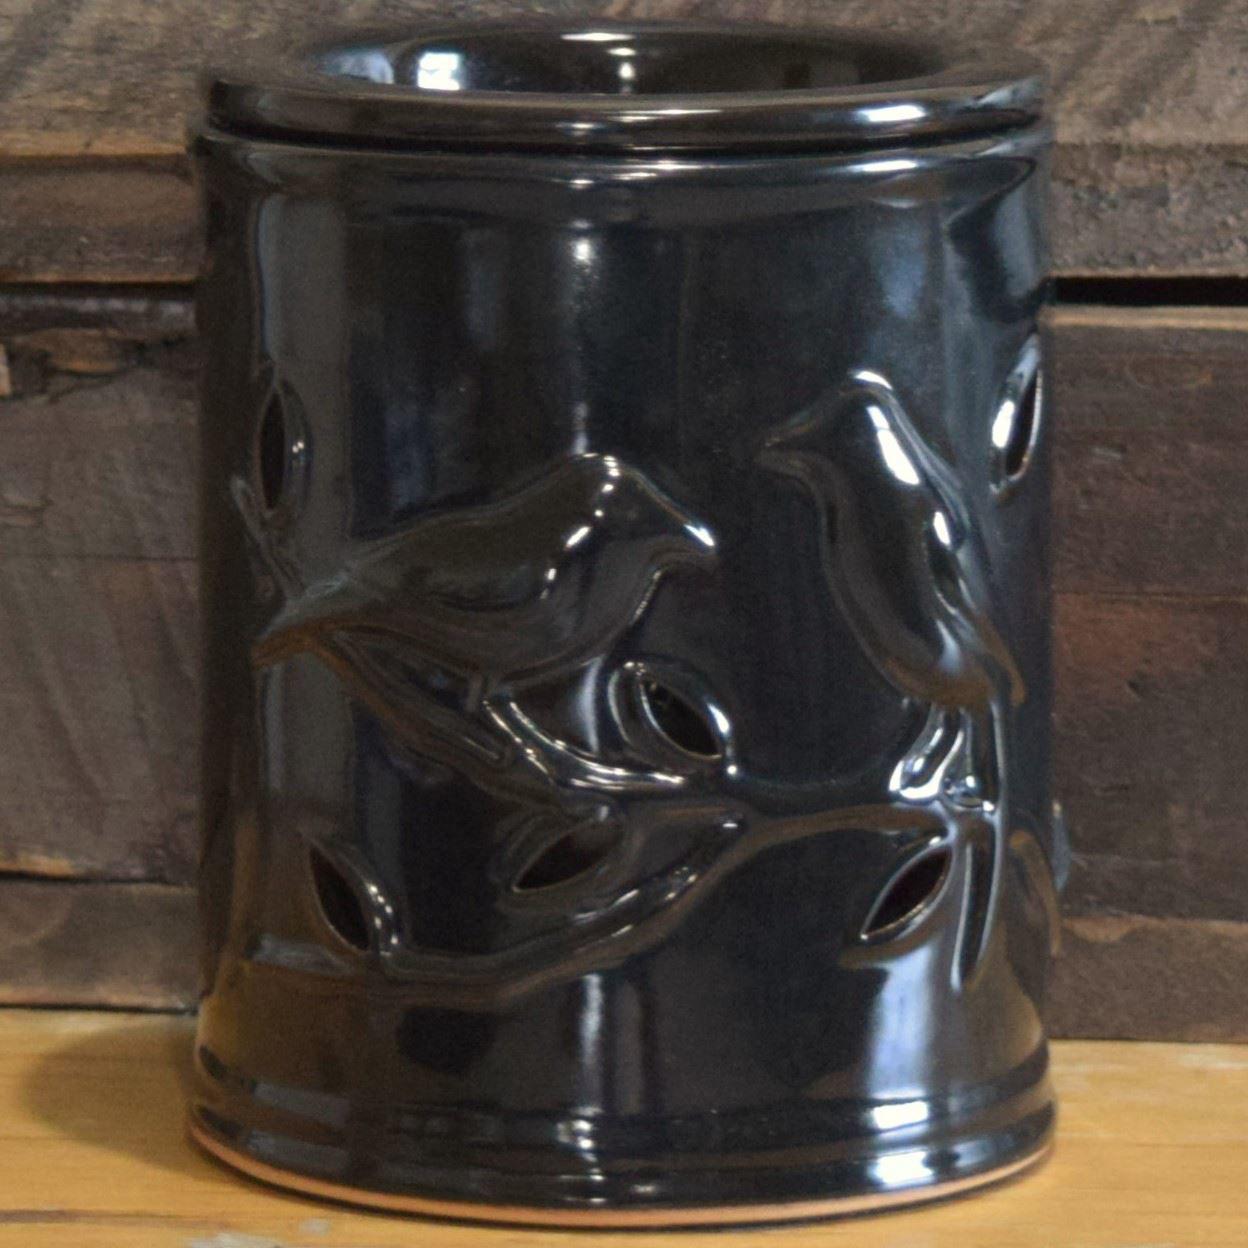 Black Bird Electric Wax Warmer by 1803 Candles